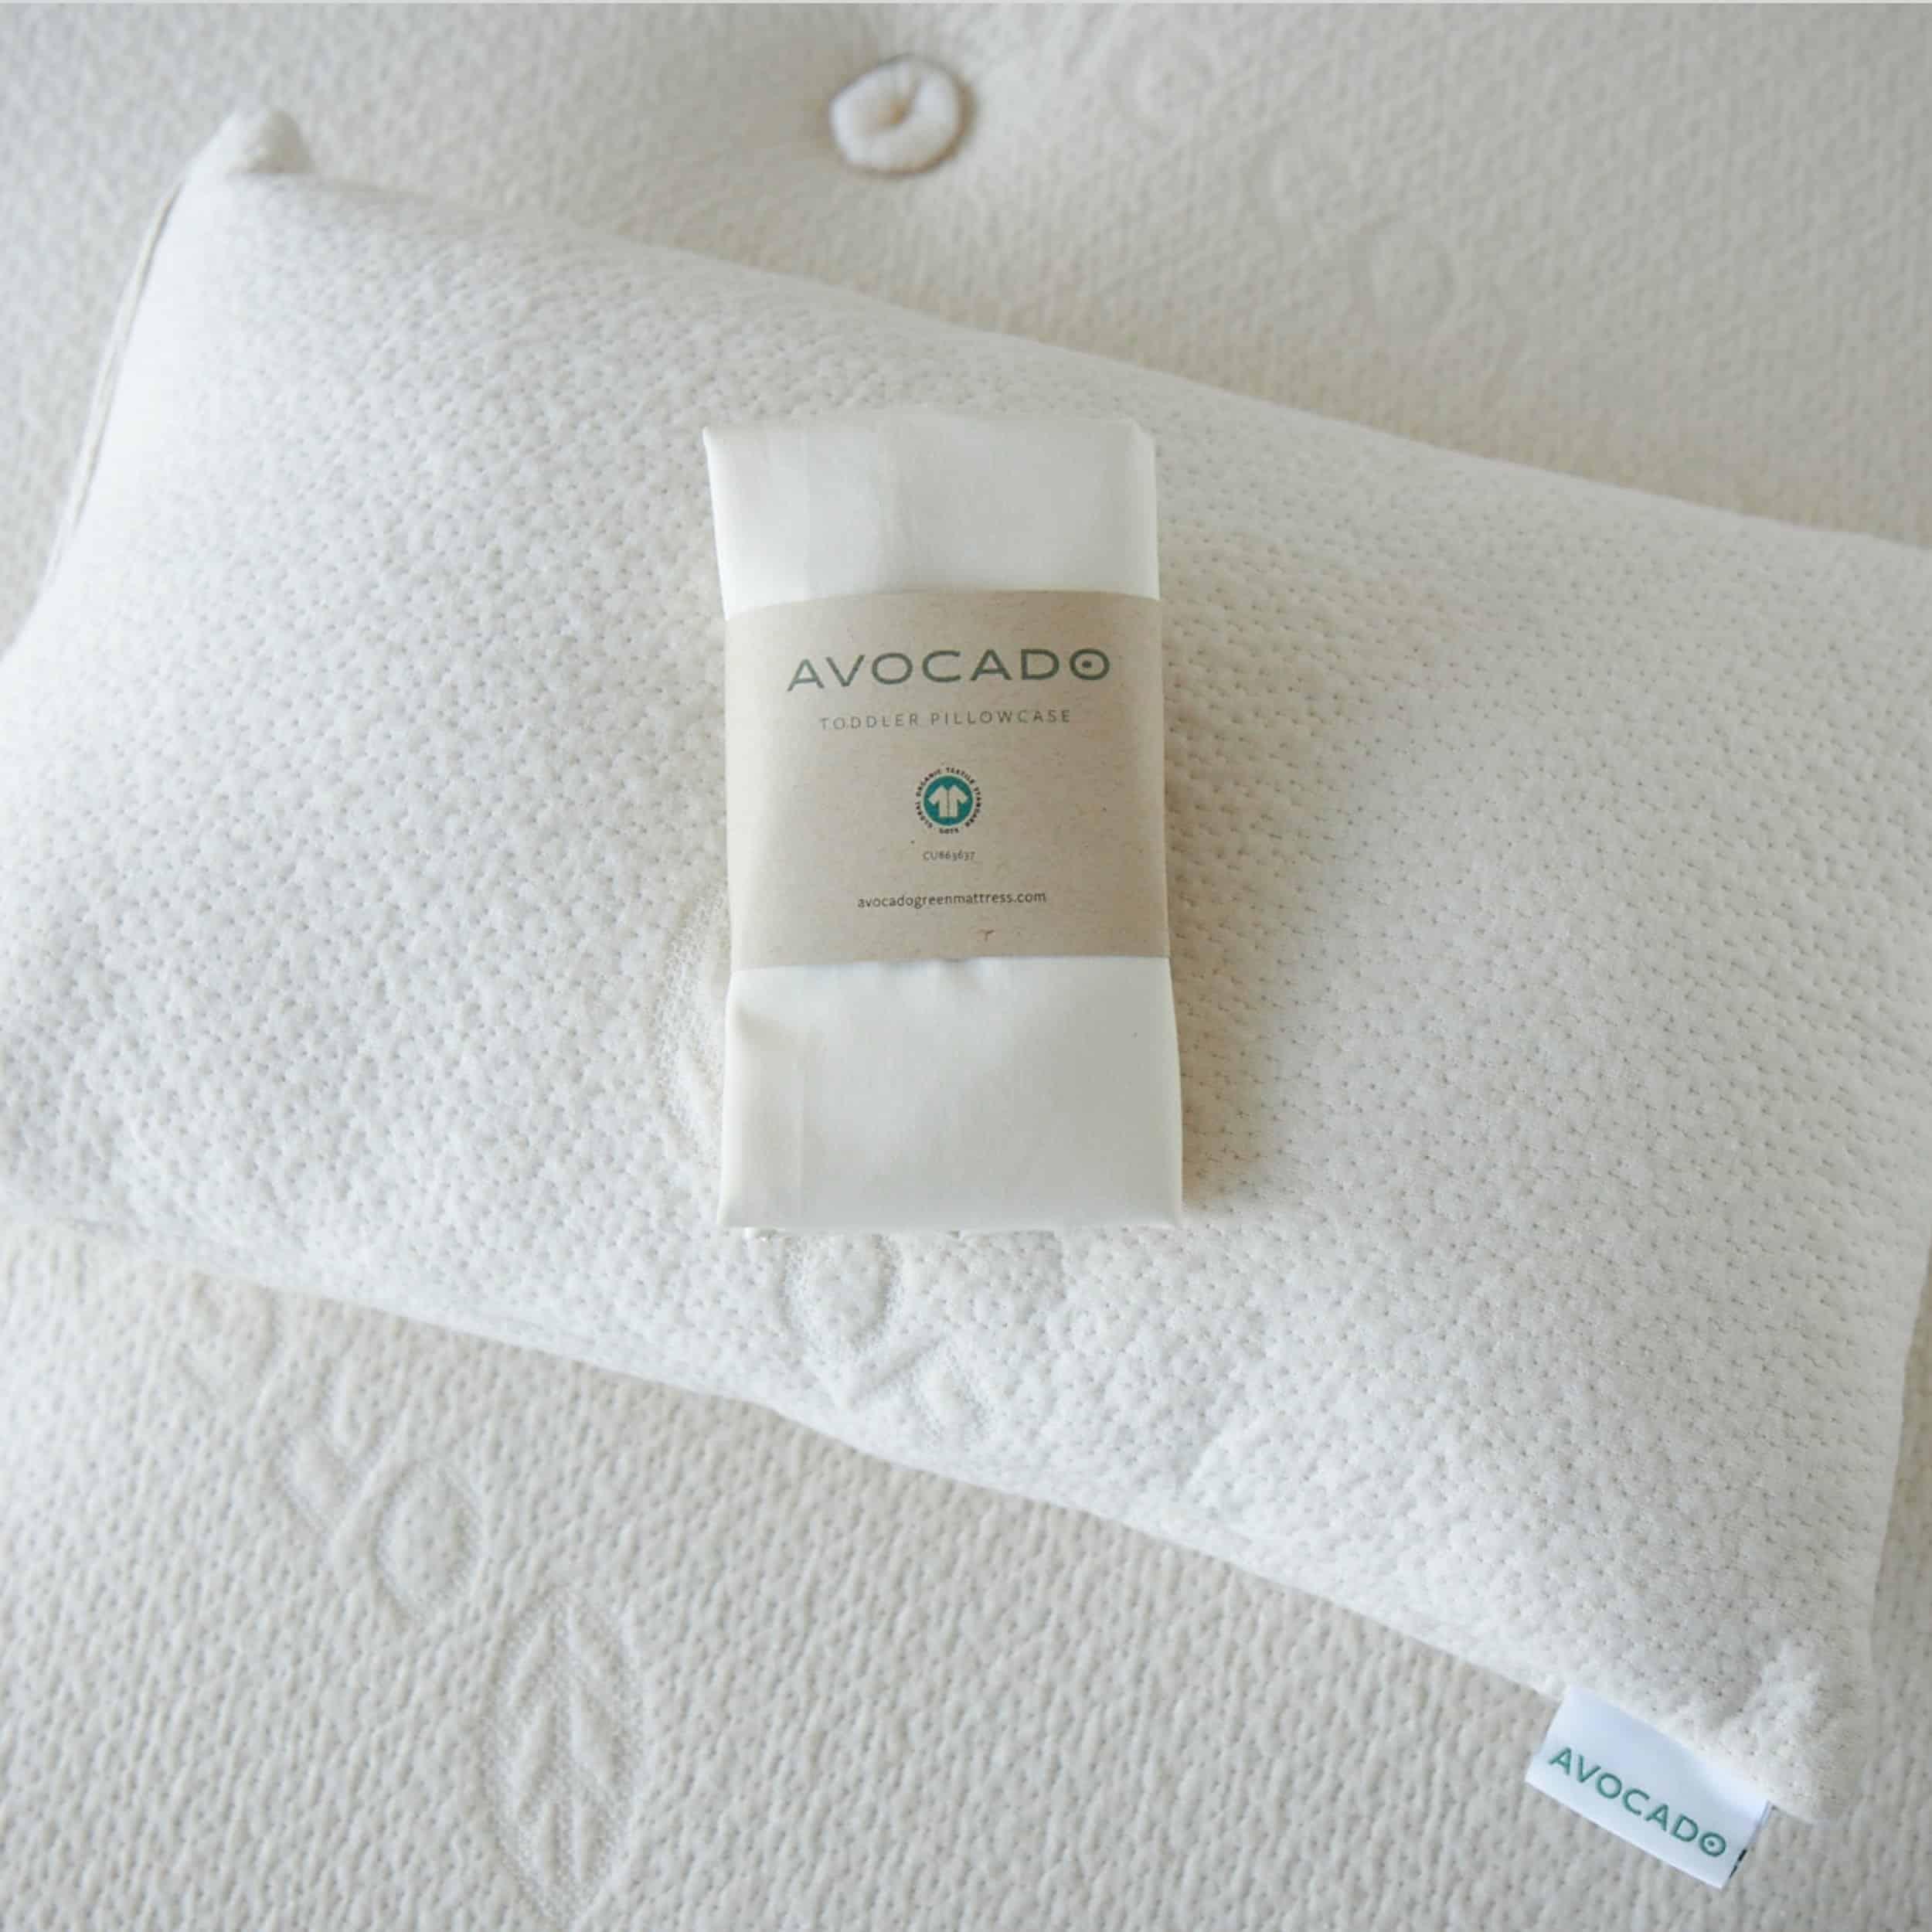 Avocado Organic Mini Pillow